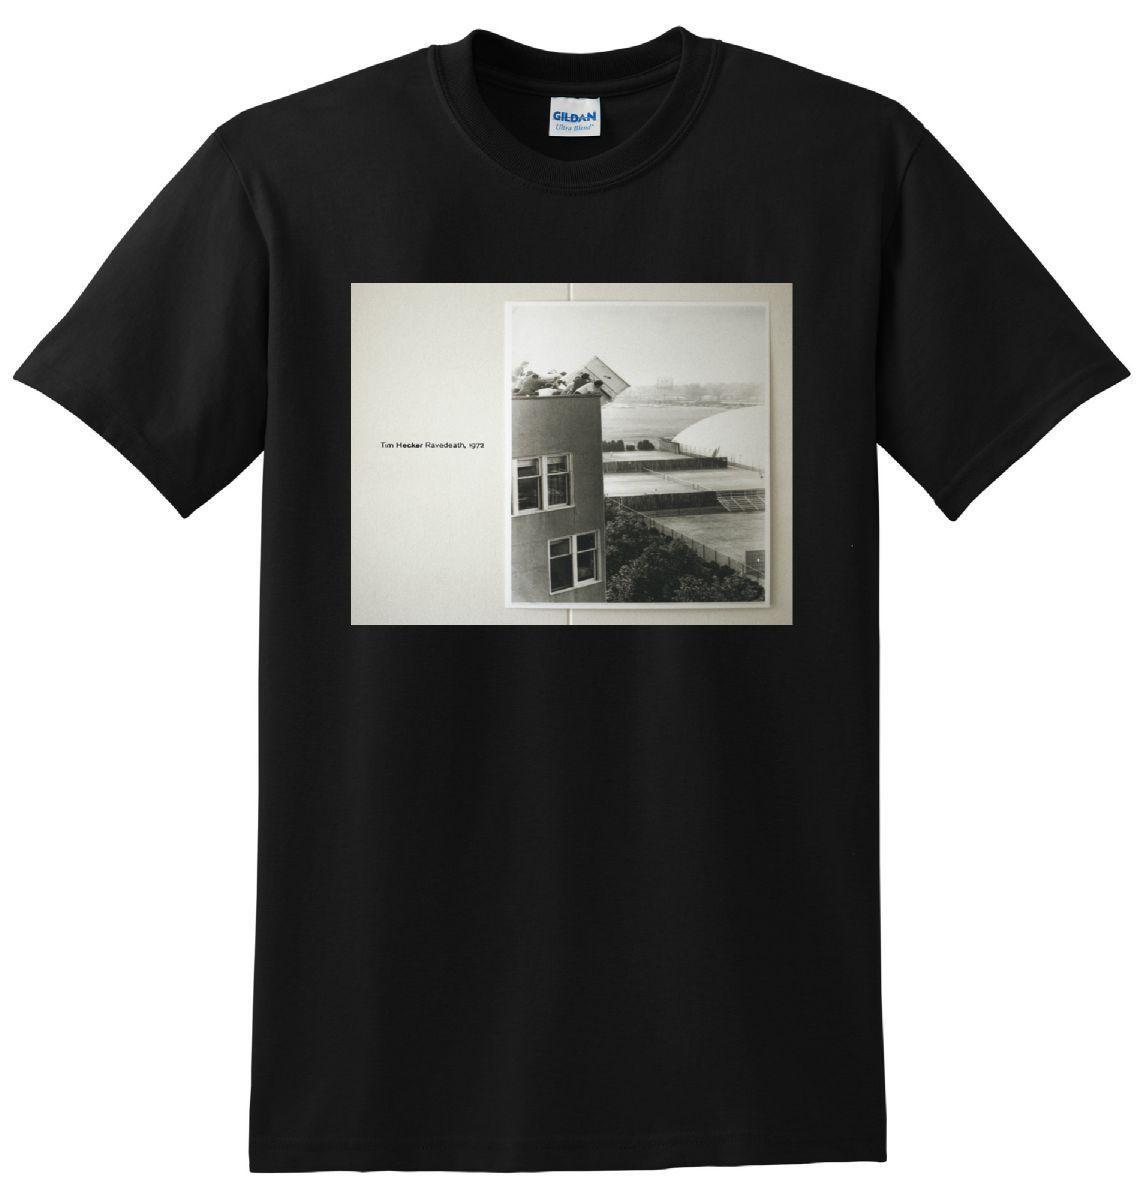 Tim Hecker T Shirt Ravedeath 1972 Vinyl Cd Cover Tee Small